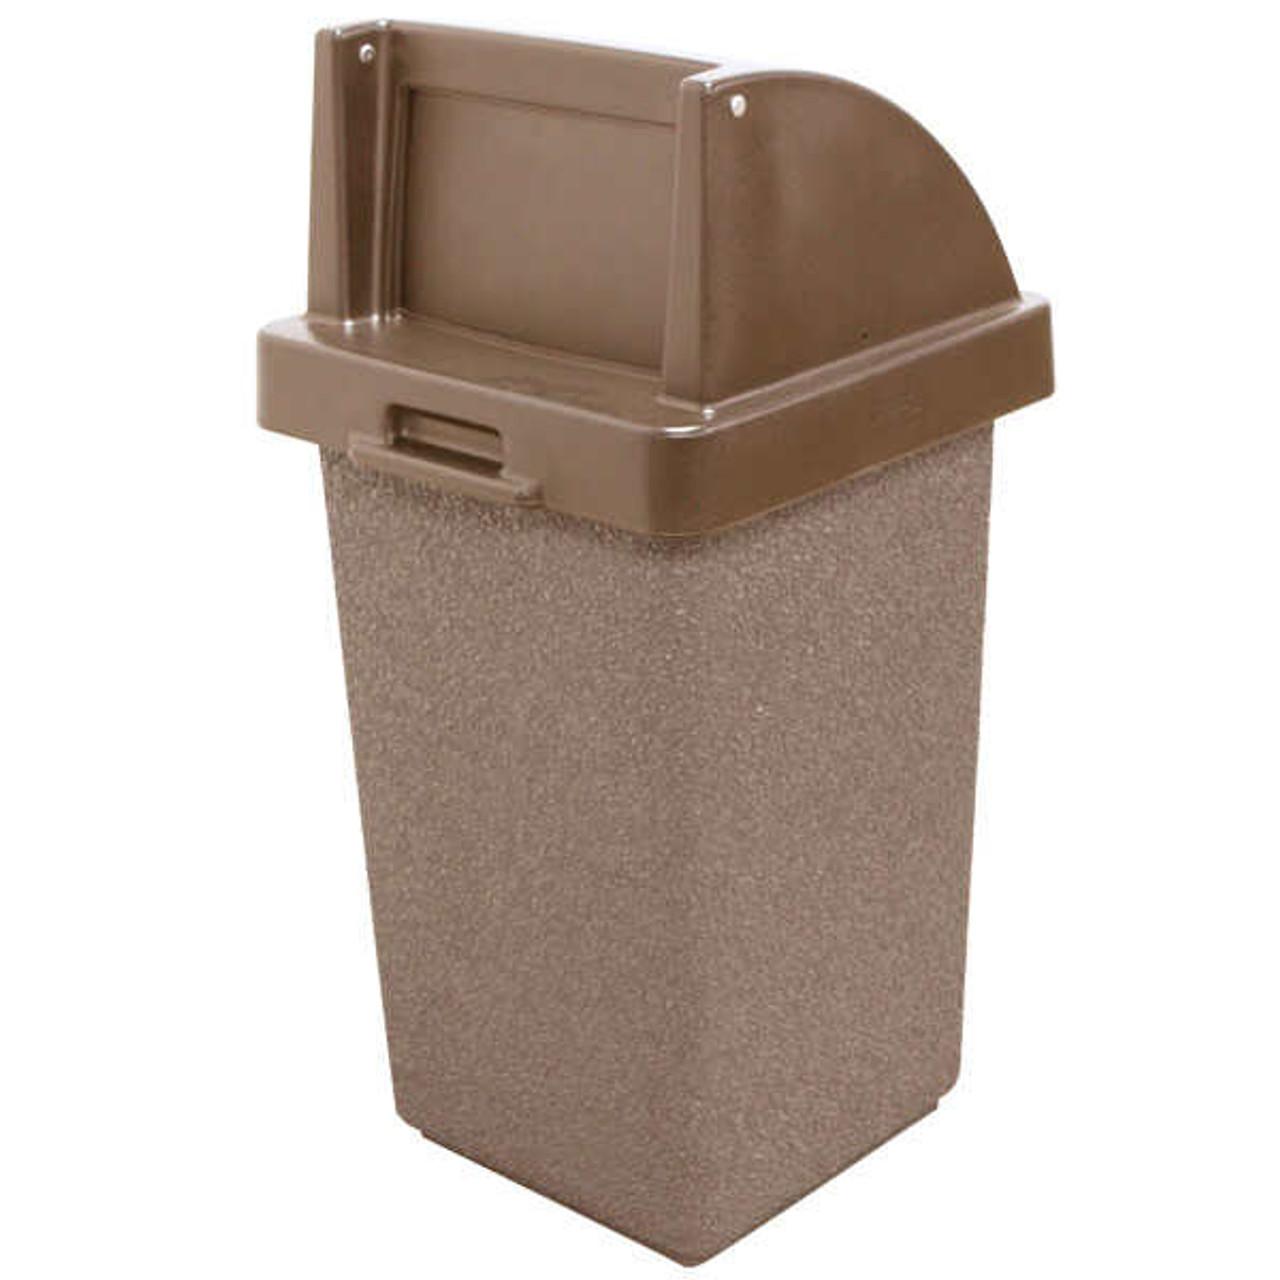 30 Gallon Concrete Push Door Lid Outdoor Trash Can TF1015QS-W22-4